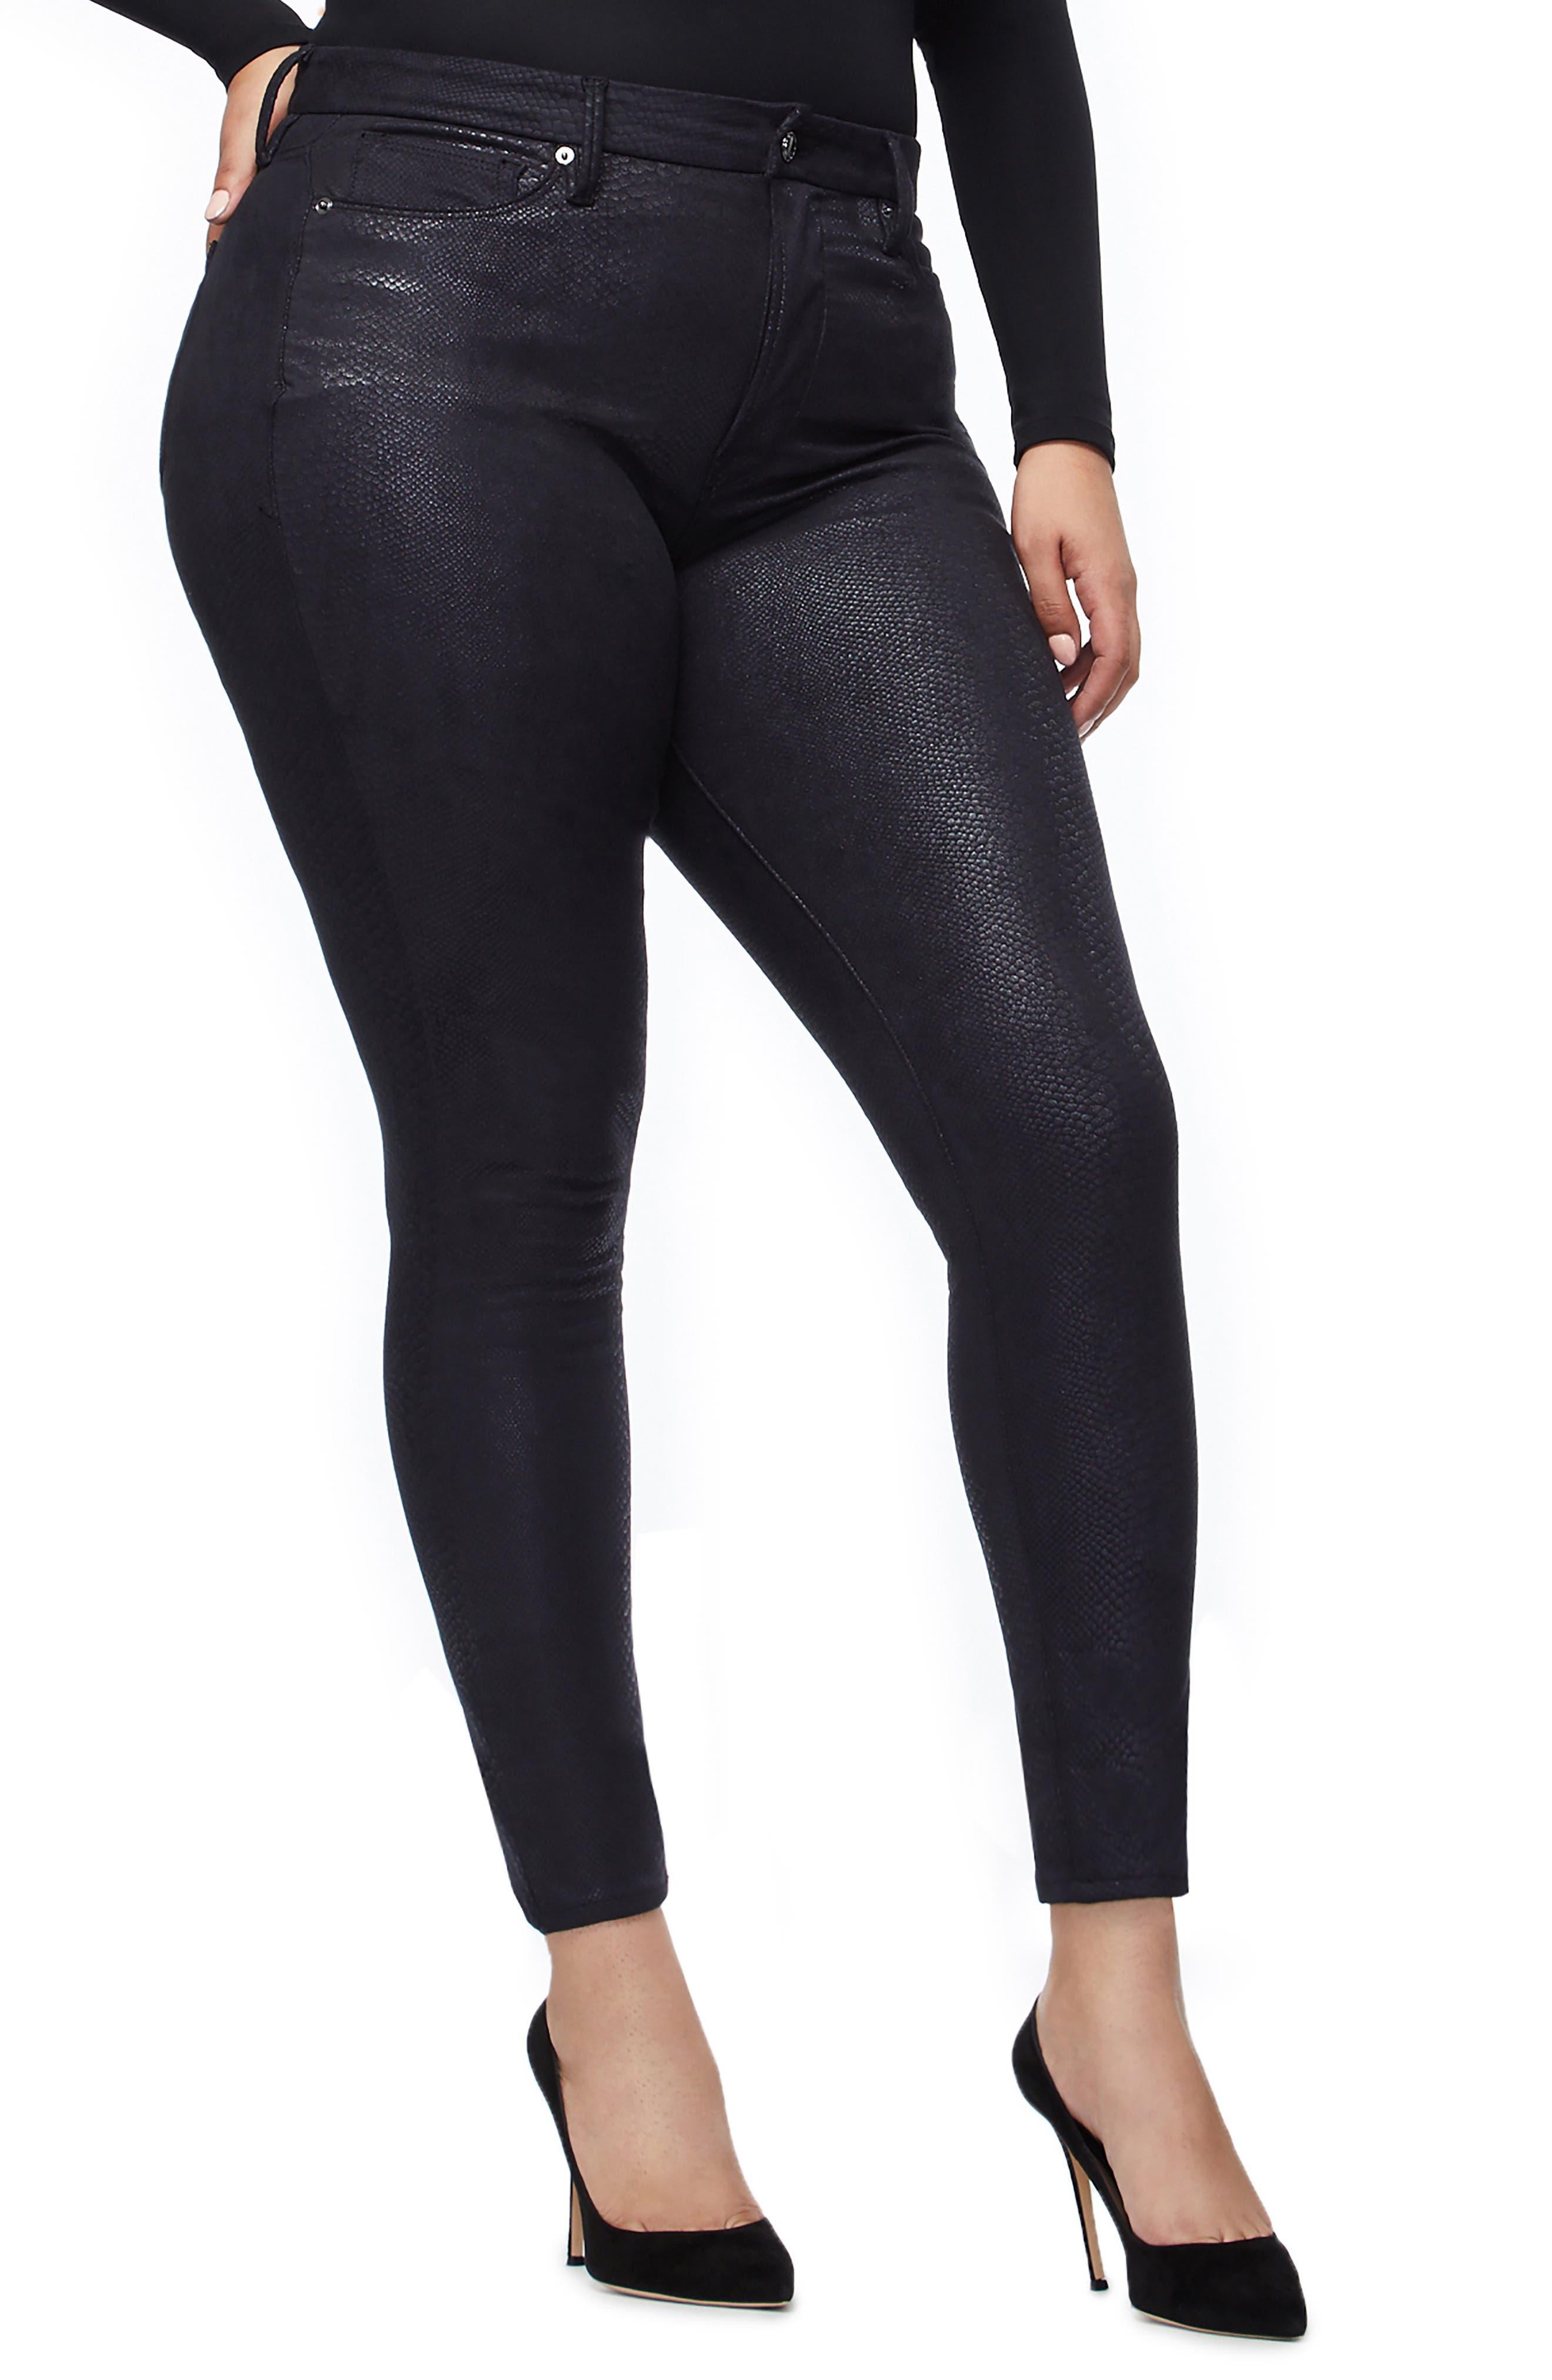 GOOD AMERICAN,                             Good Legs Metallic Snake Print Skinny Jeans,                             Alternate thumbnail 8, color,                             BLACK041